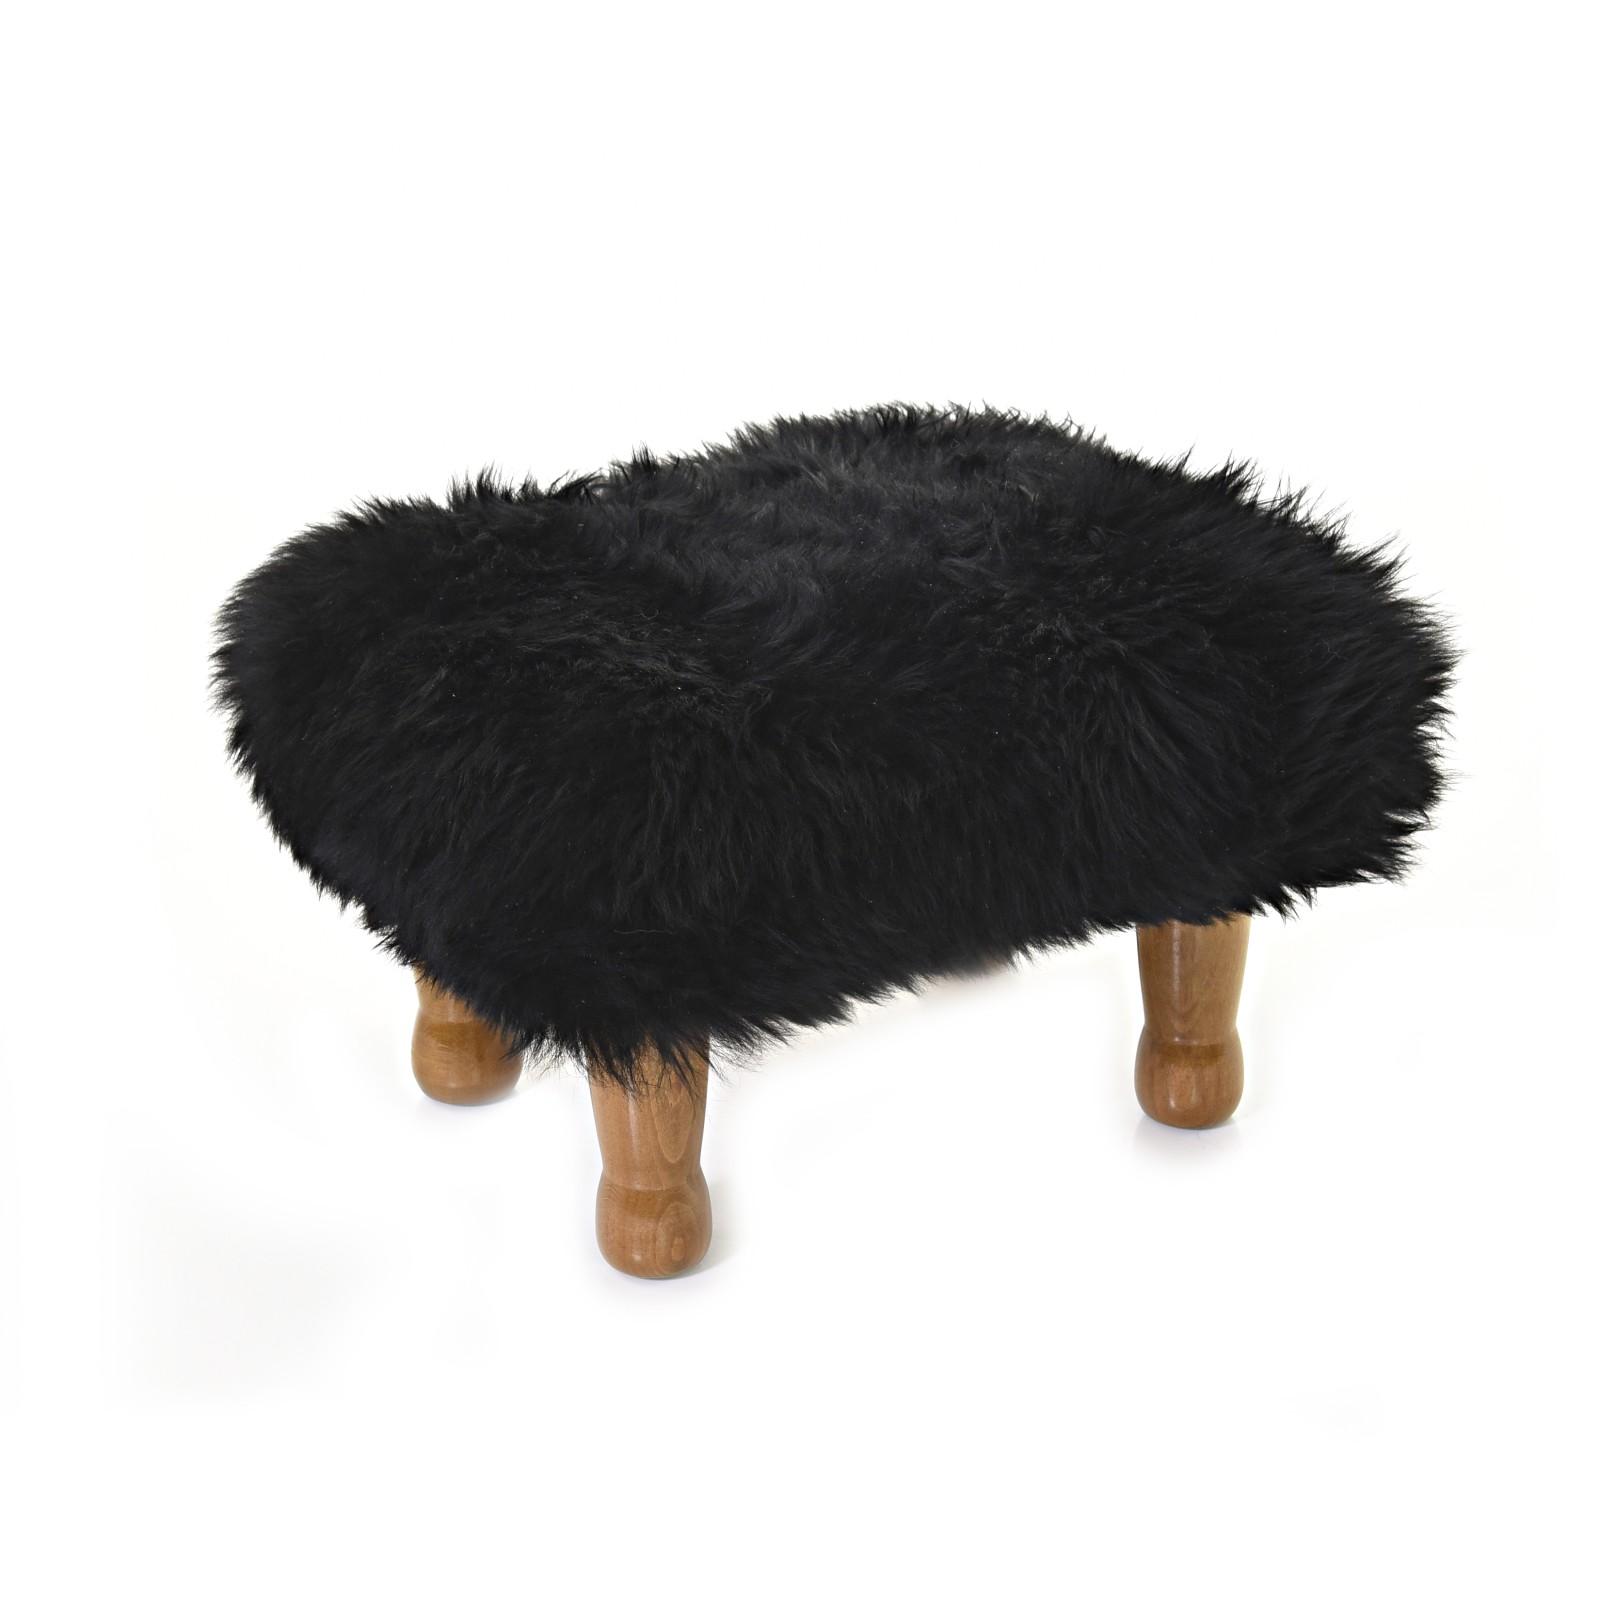 Anwen - Sheepskin Footstool Coal Black